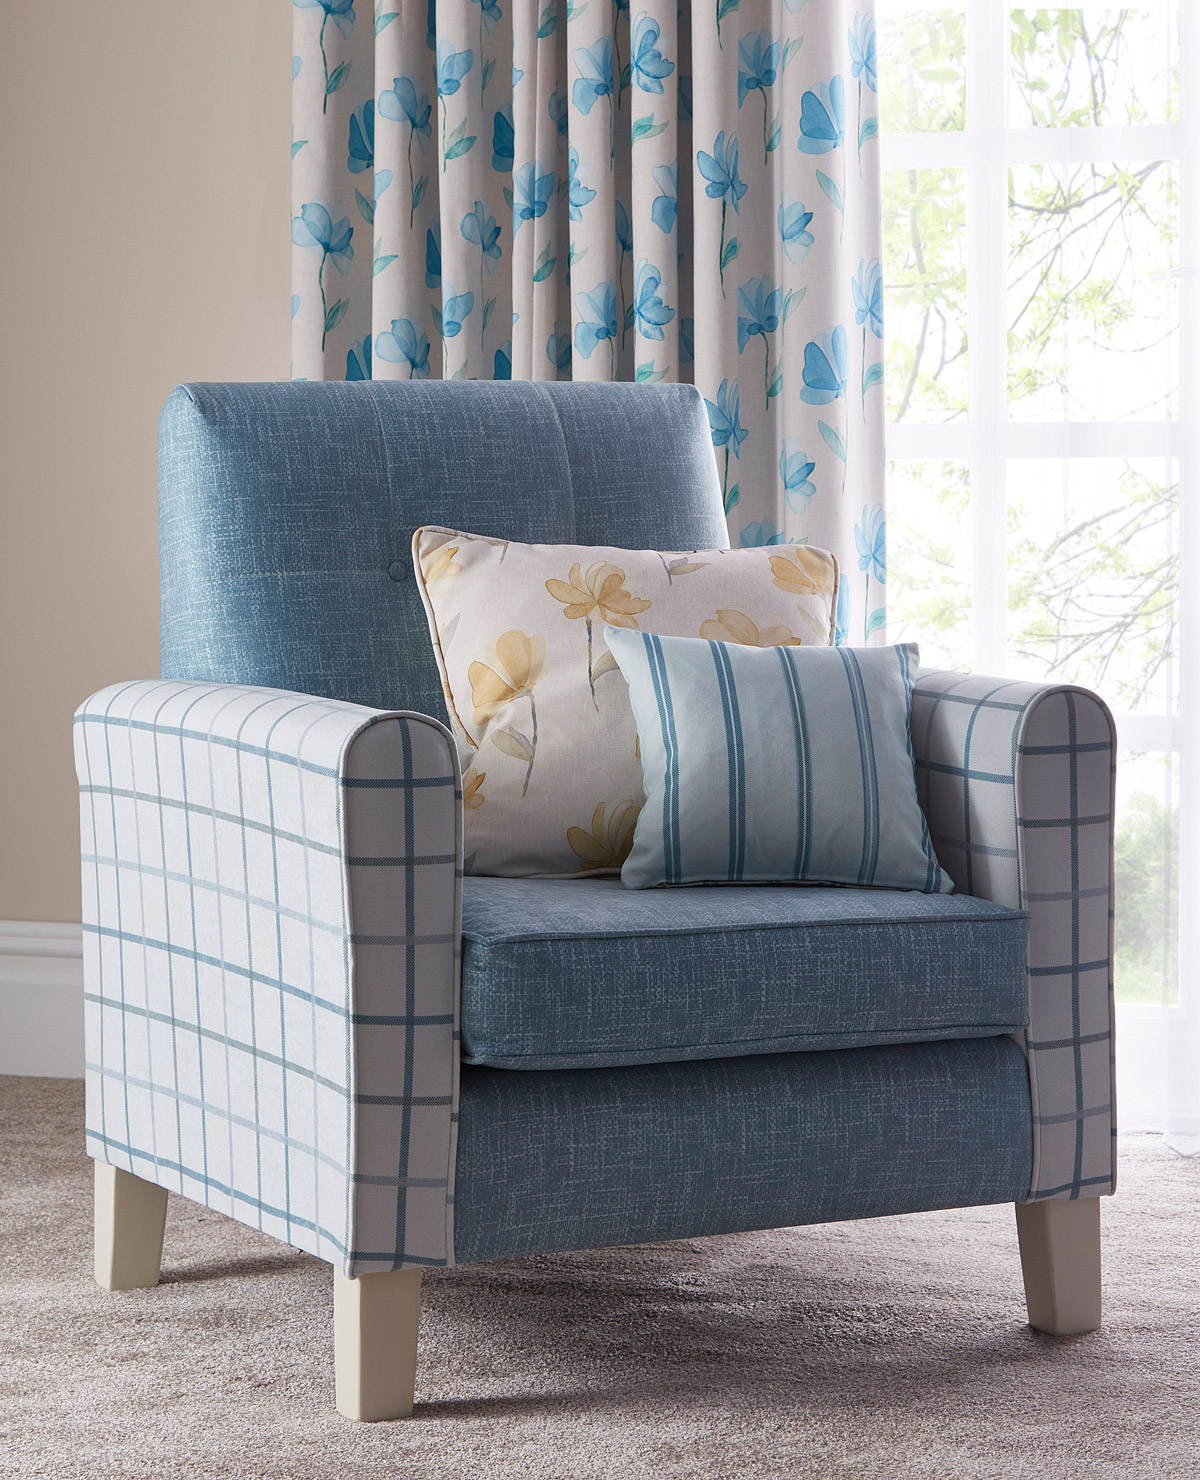 Bespoke fabric design blog by Bespoke by Evans featuring Evans Textiles bedroom scheme armchair detail